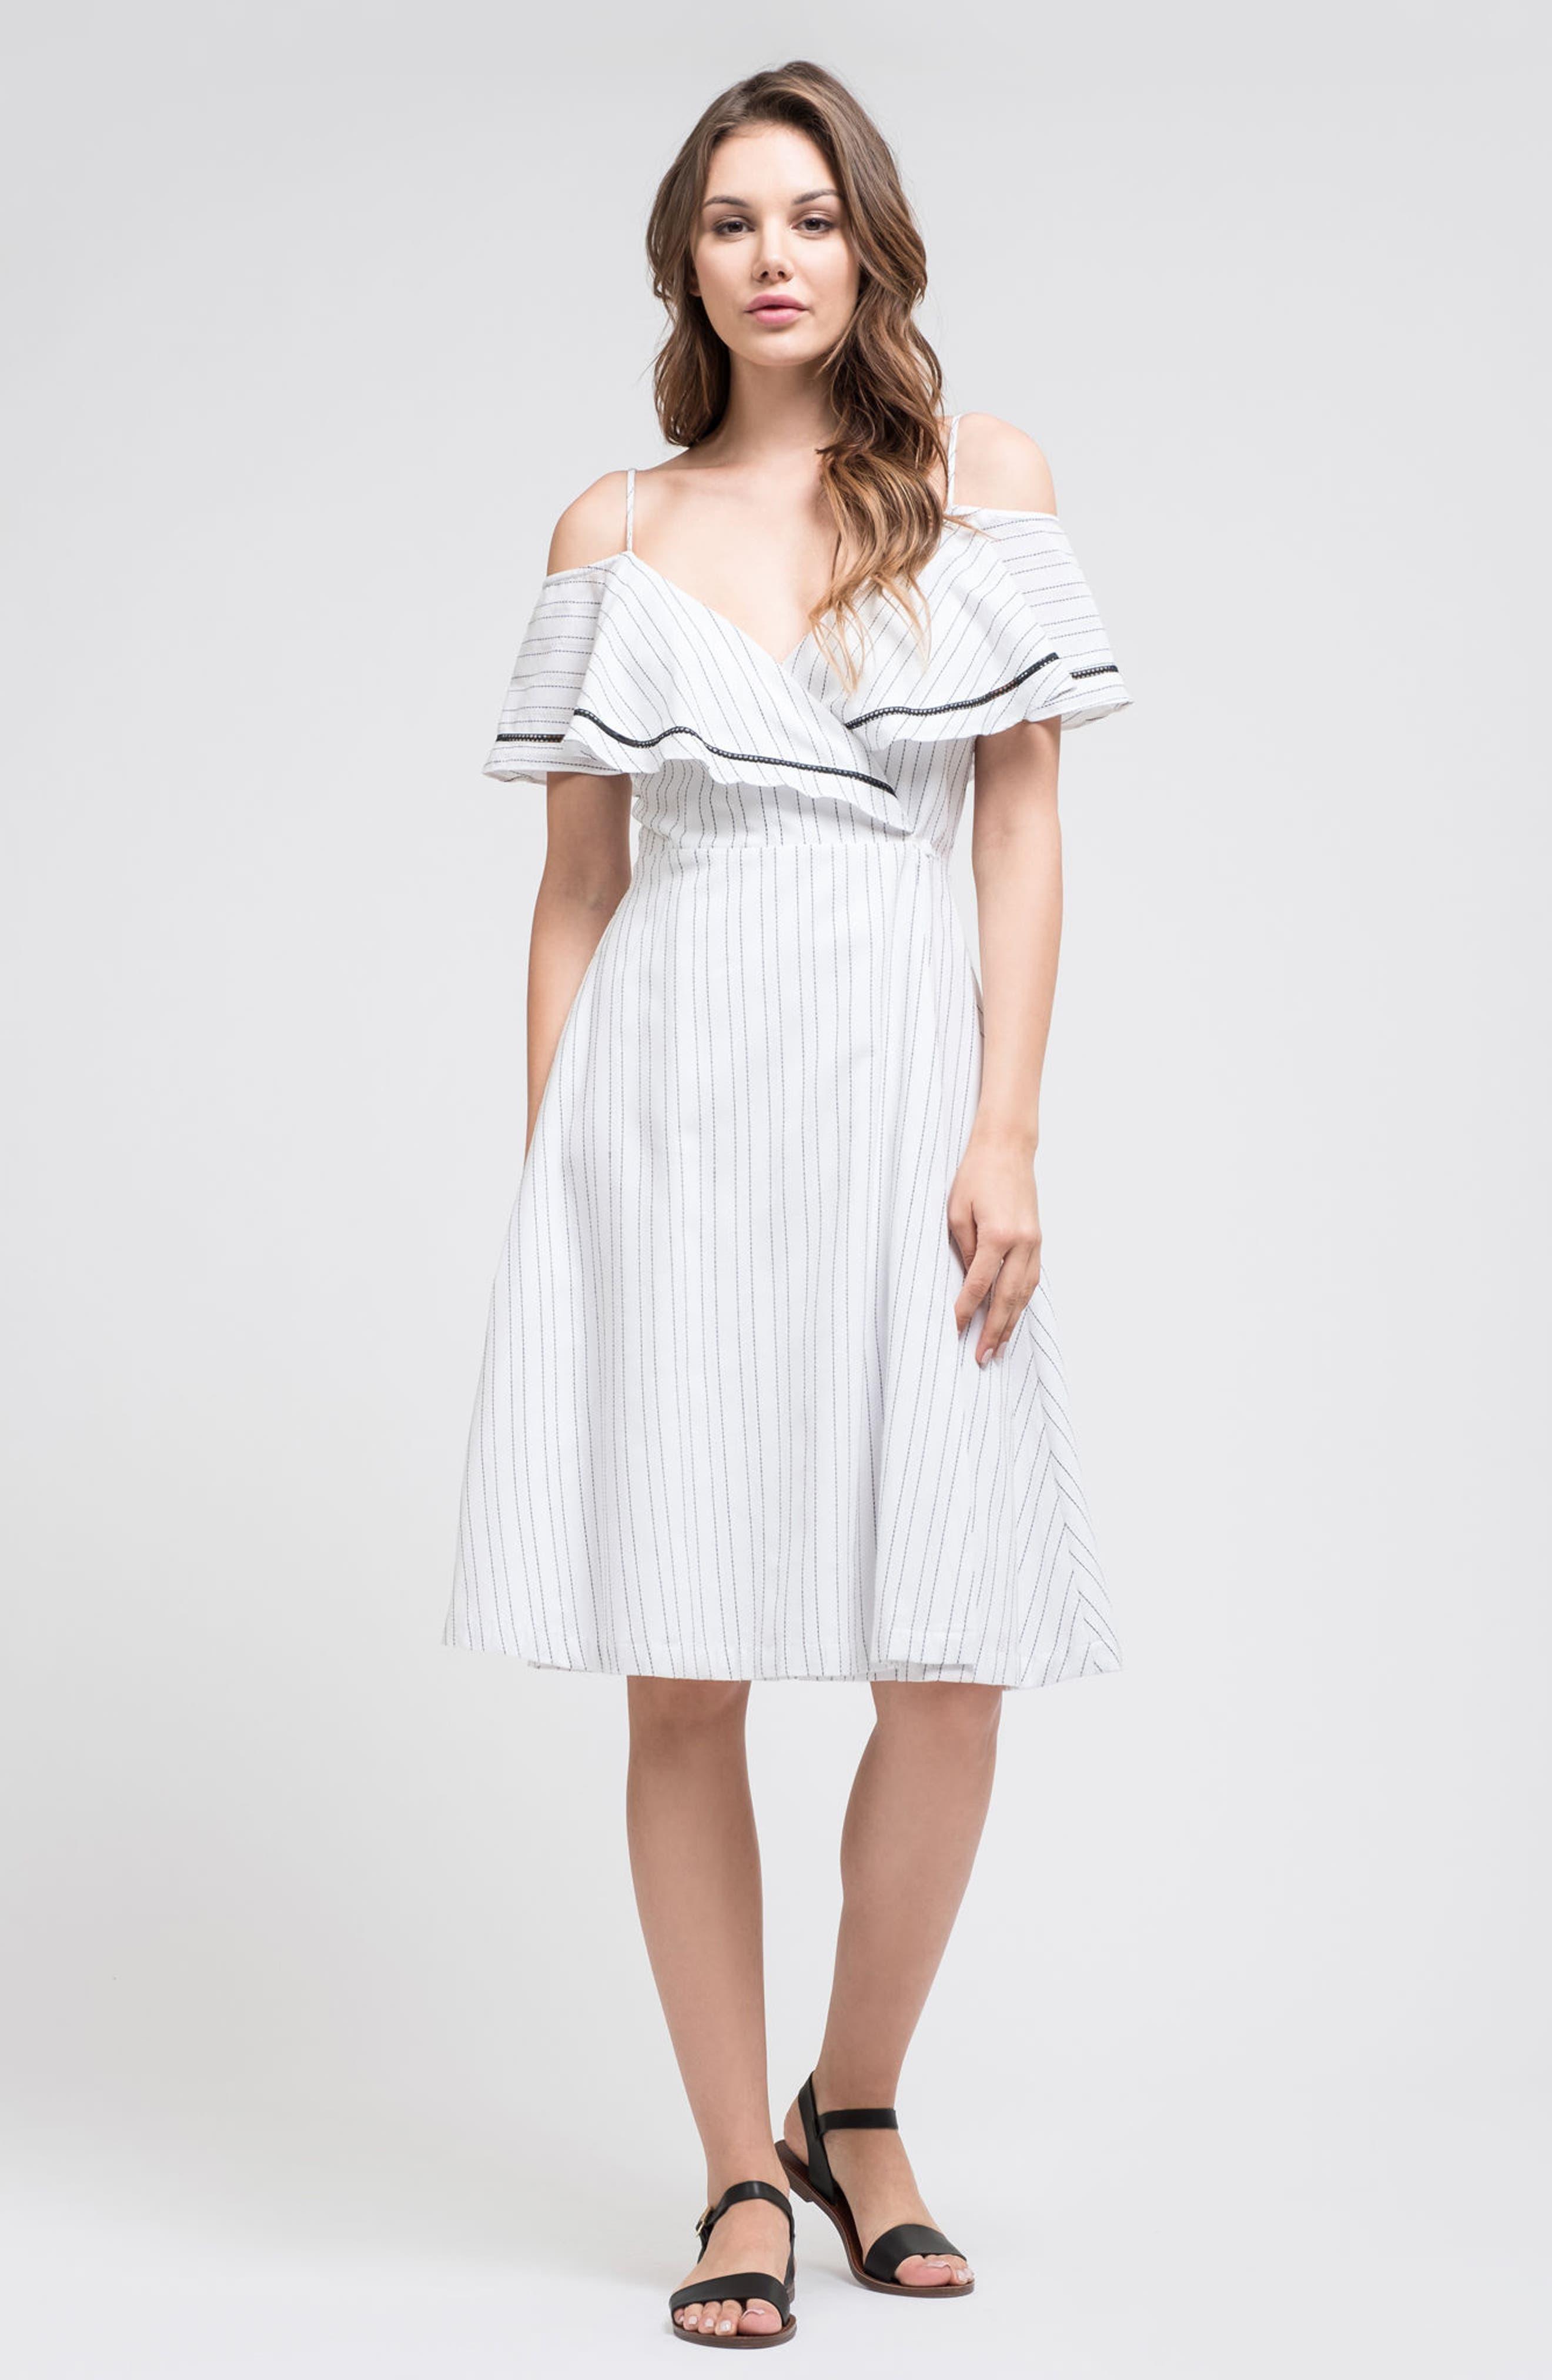 Cold Shoulder Midi Dress,                             Alternate thumbnail 2, color,                             White/ Black